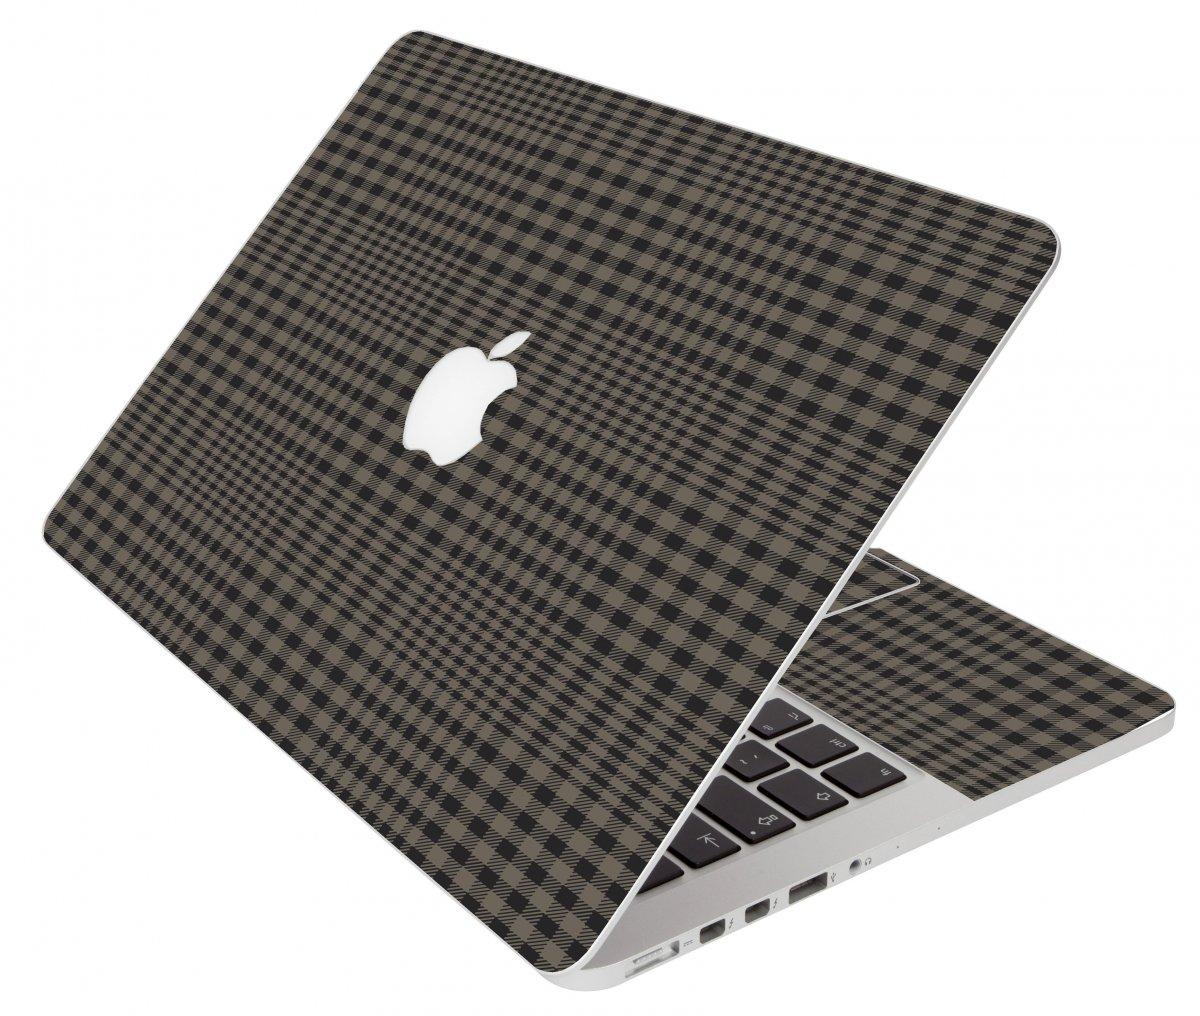 Beige Plaid Apple Macbook Original 13 A1181 Laptop Skin